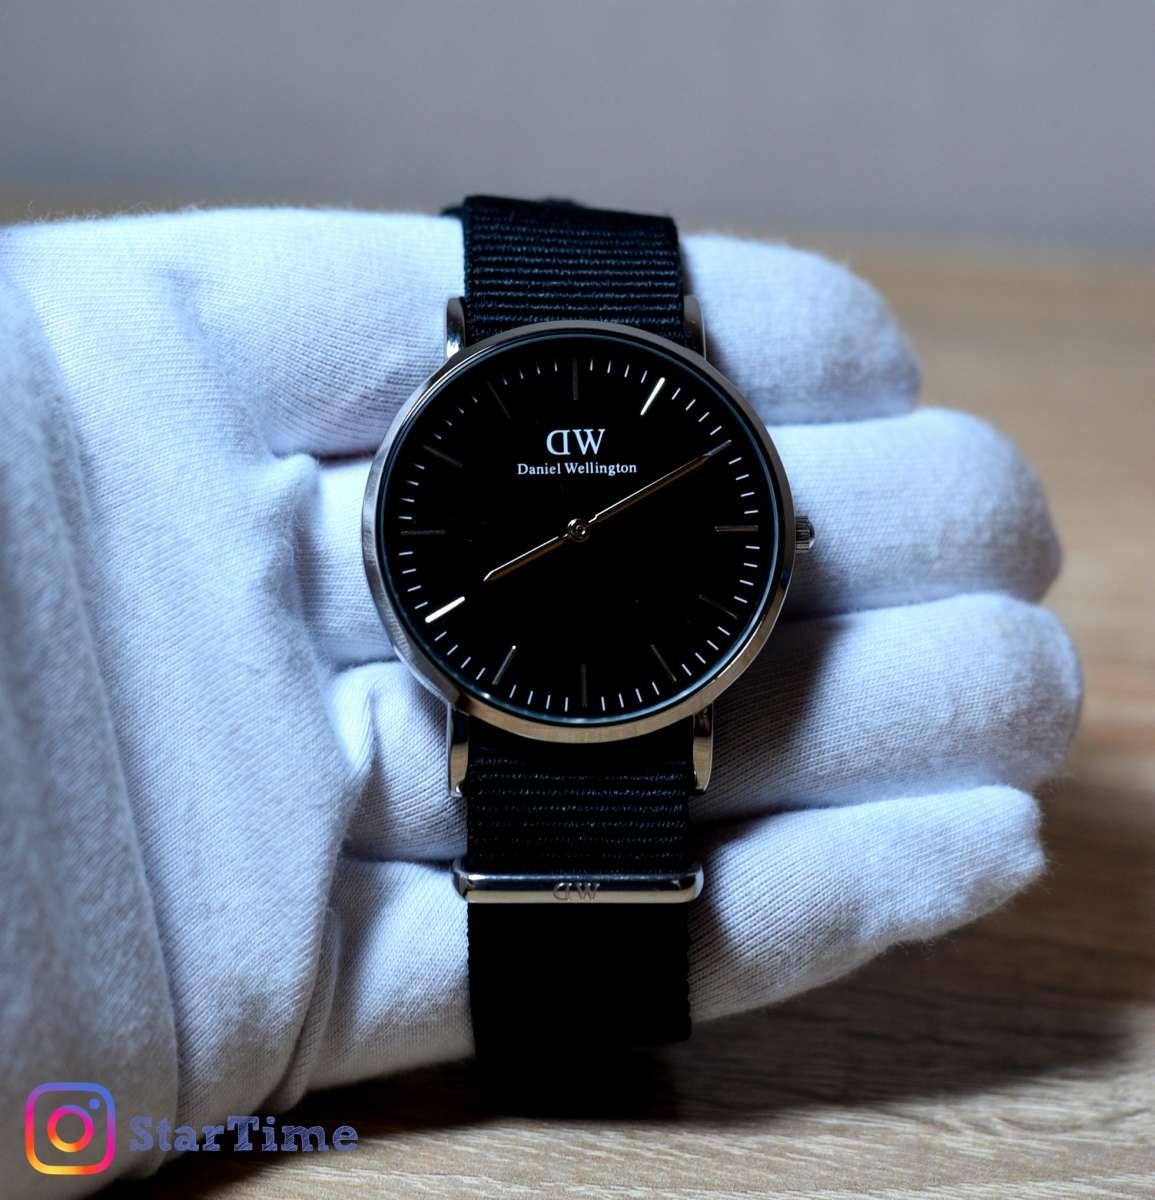 Мужские Наручные Часы Daniel Wellington Чоловічий Годинник Кварц +опт e4c757f84db3e